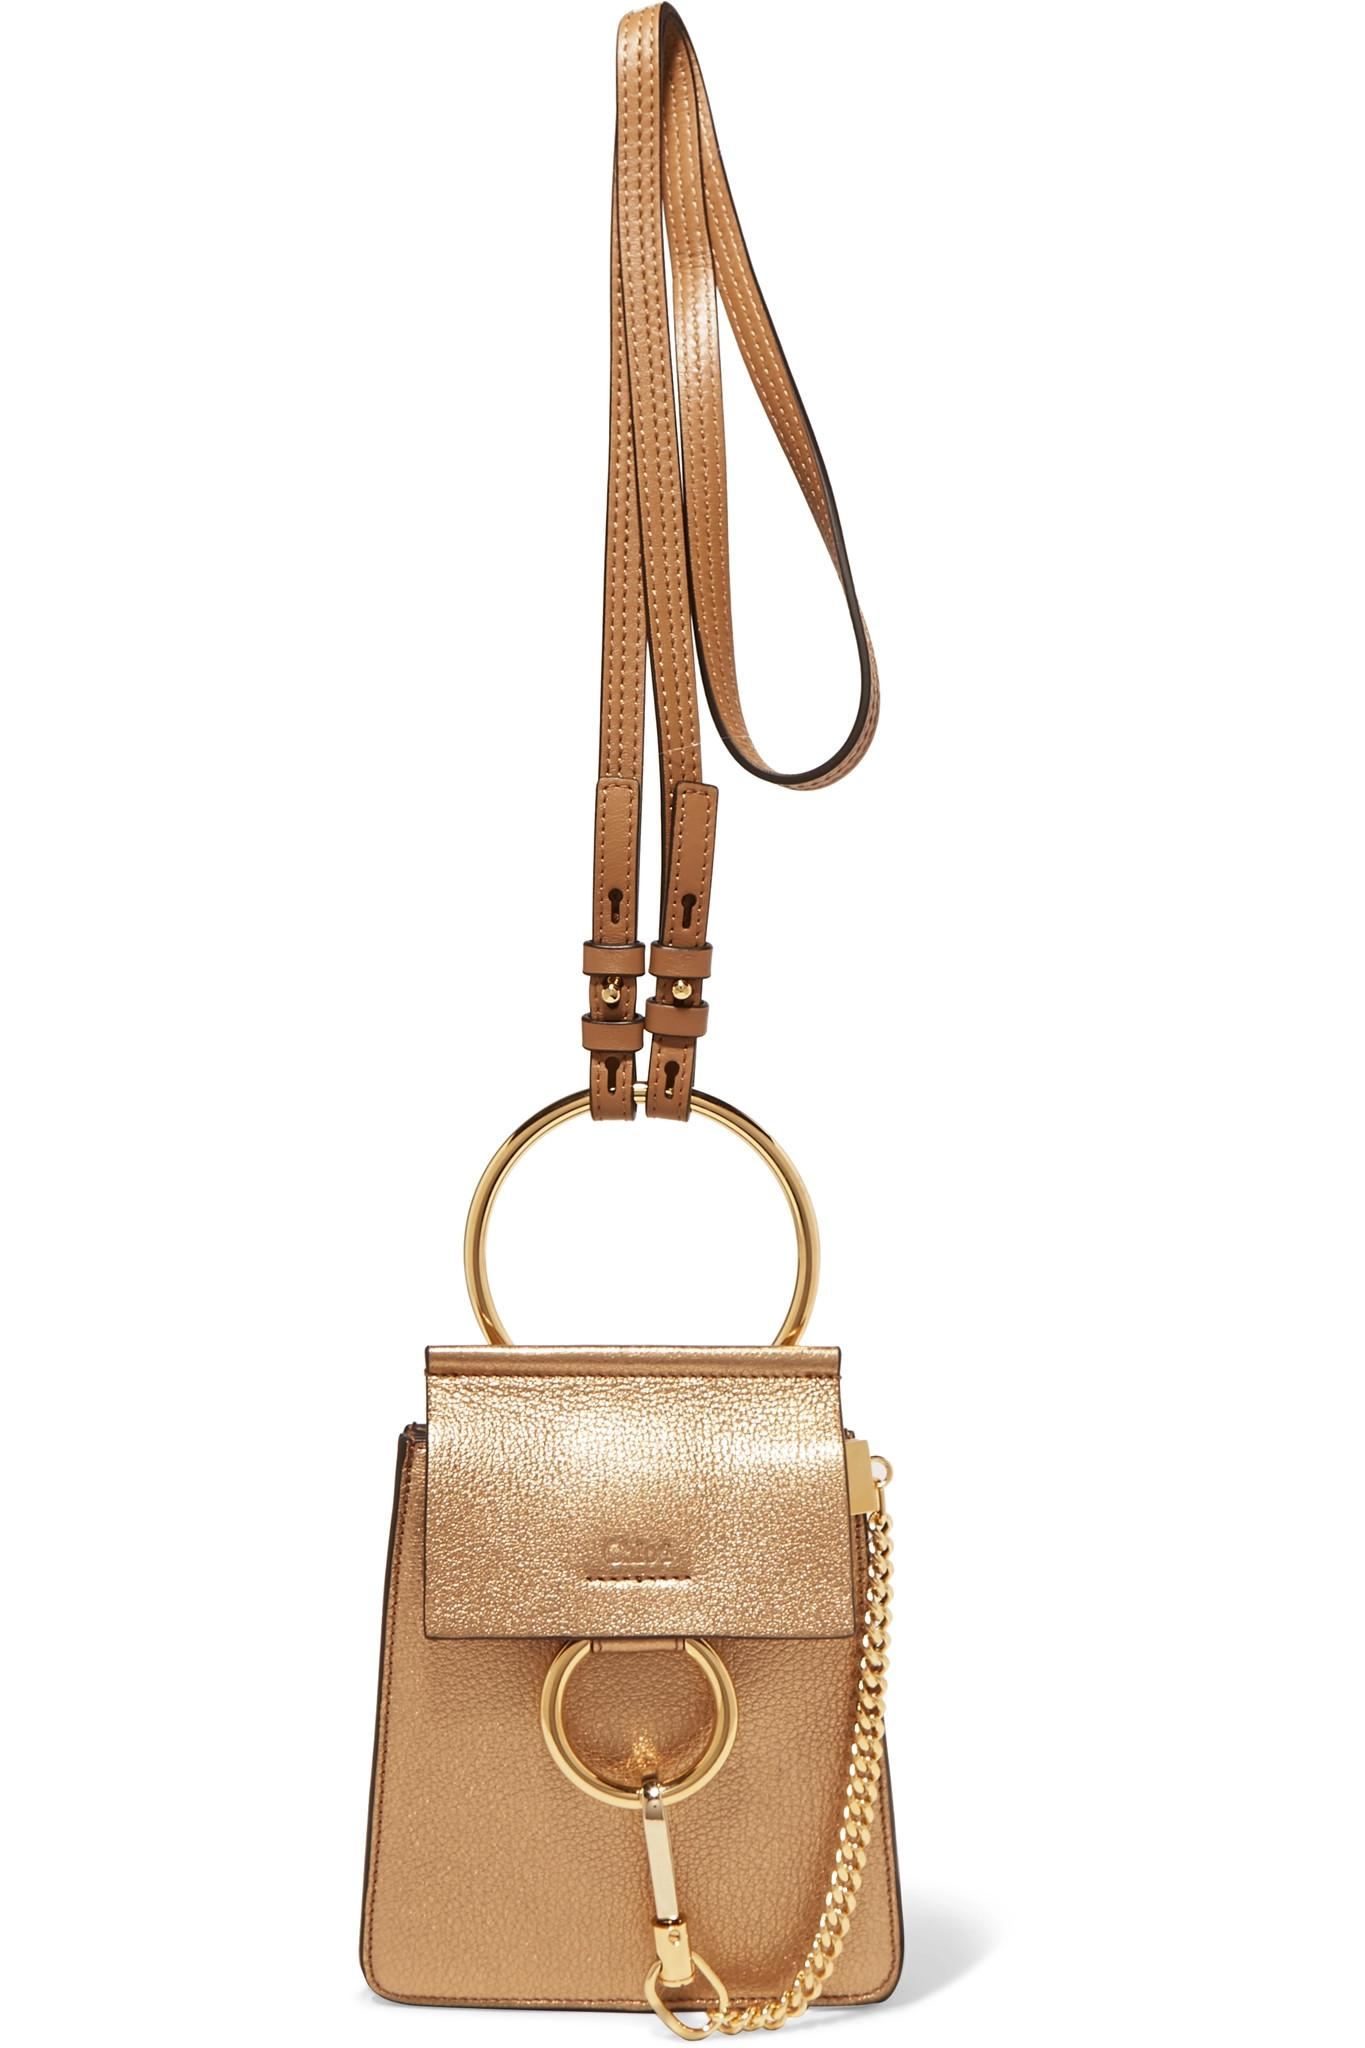 6b02eee71b Chloé. Women's Faye Bracelet Metallic Textured-leather Shoulder Bag